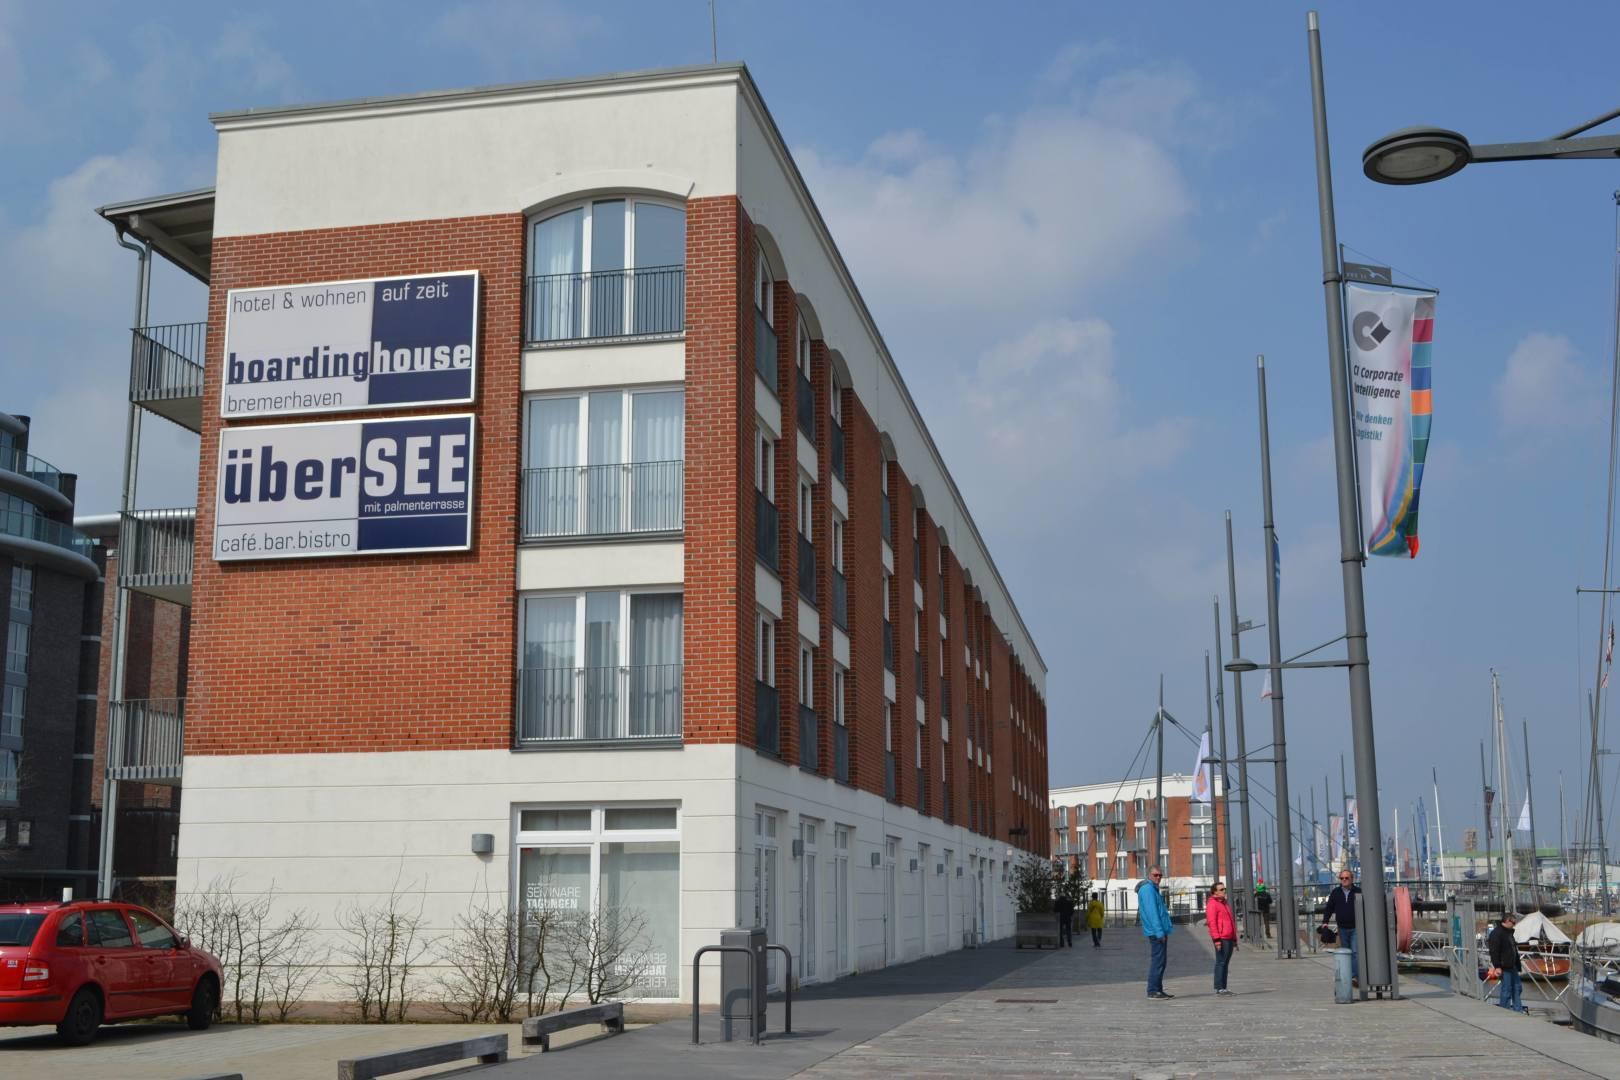 Lloyd Marina & Boardinghouse – Bremerhaven.de